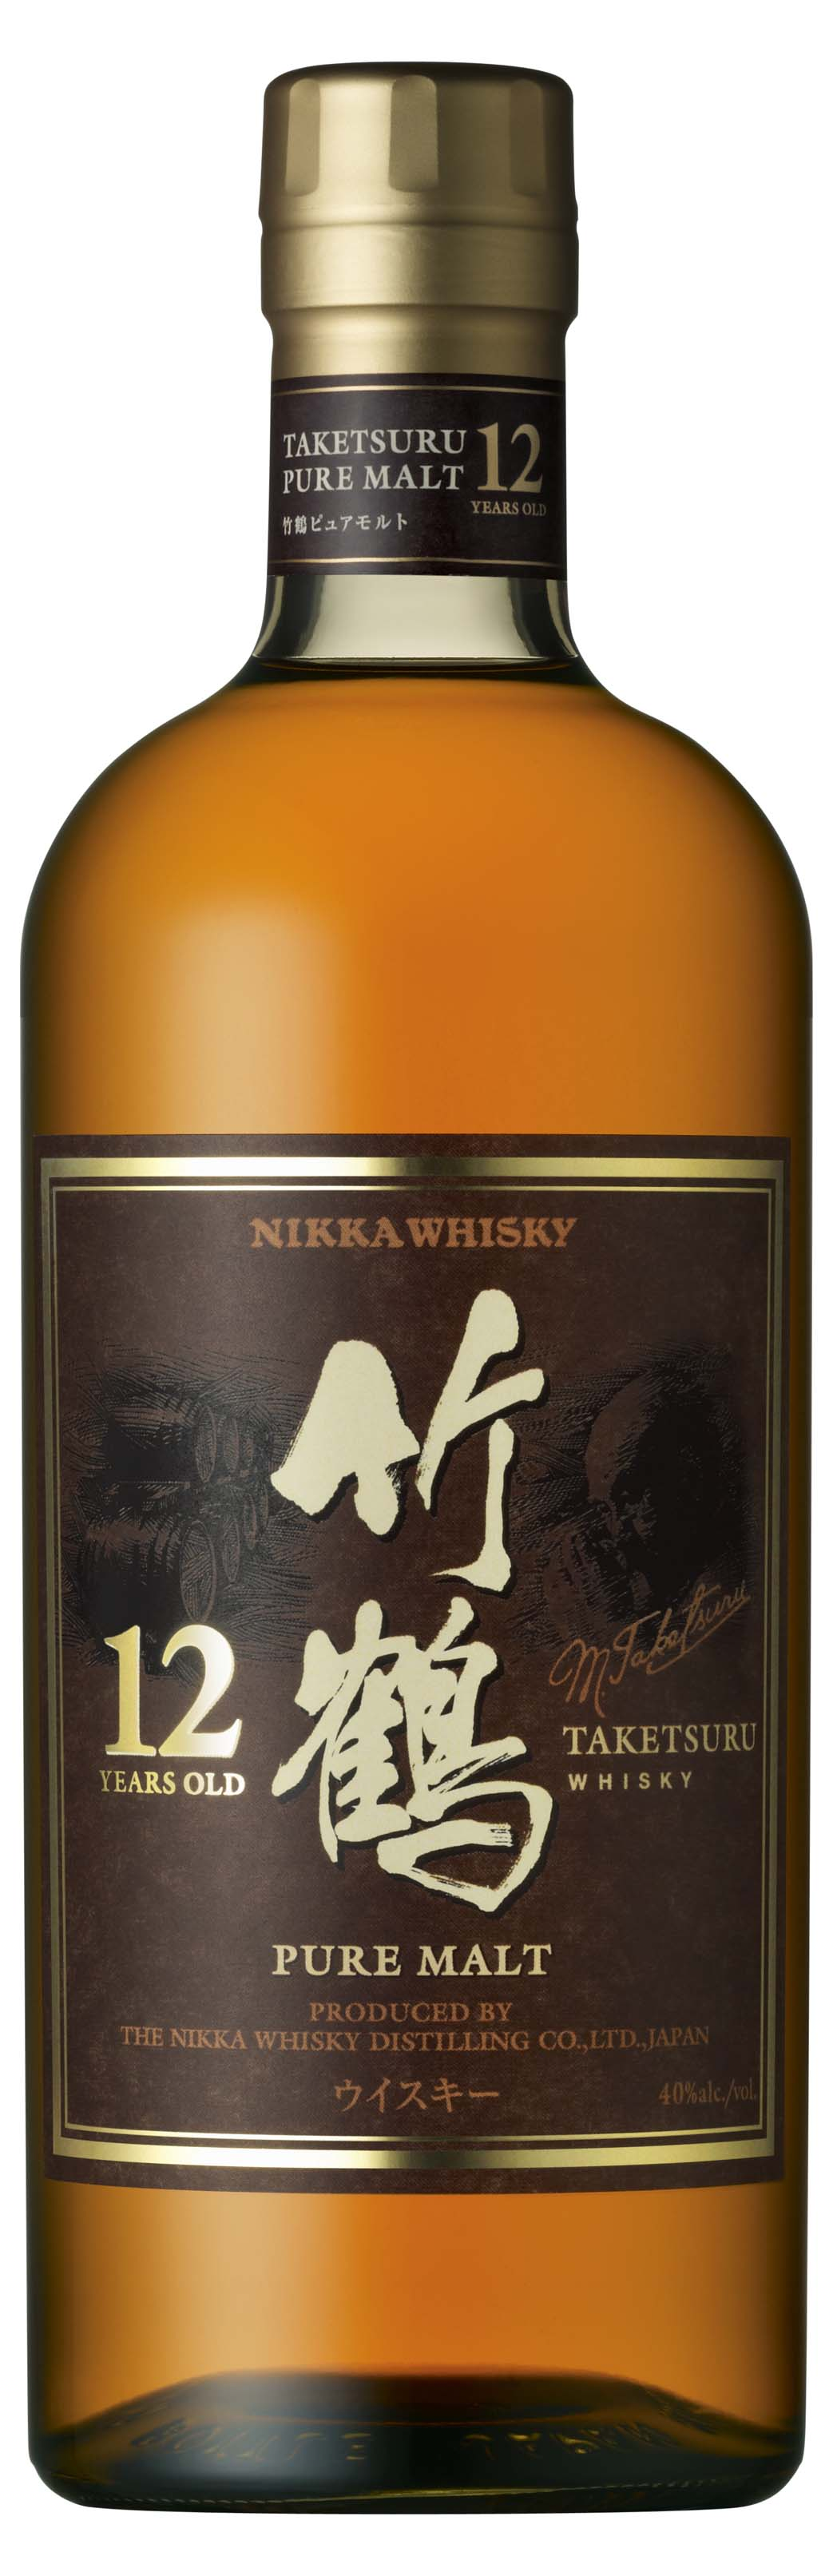 Nikka Taketsuru Pure Malt 12 Years Old